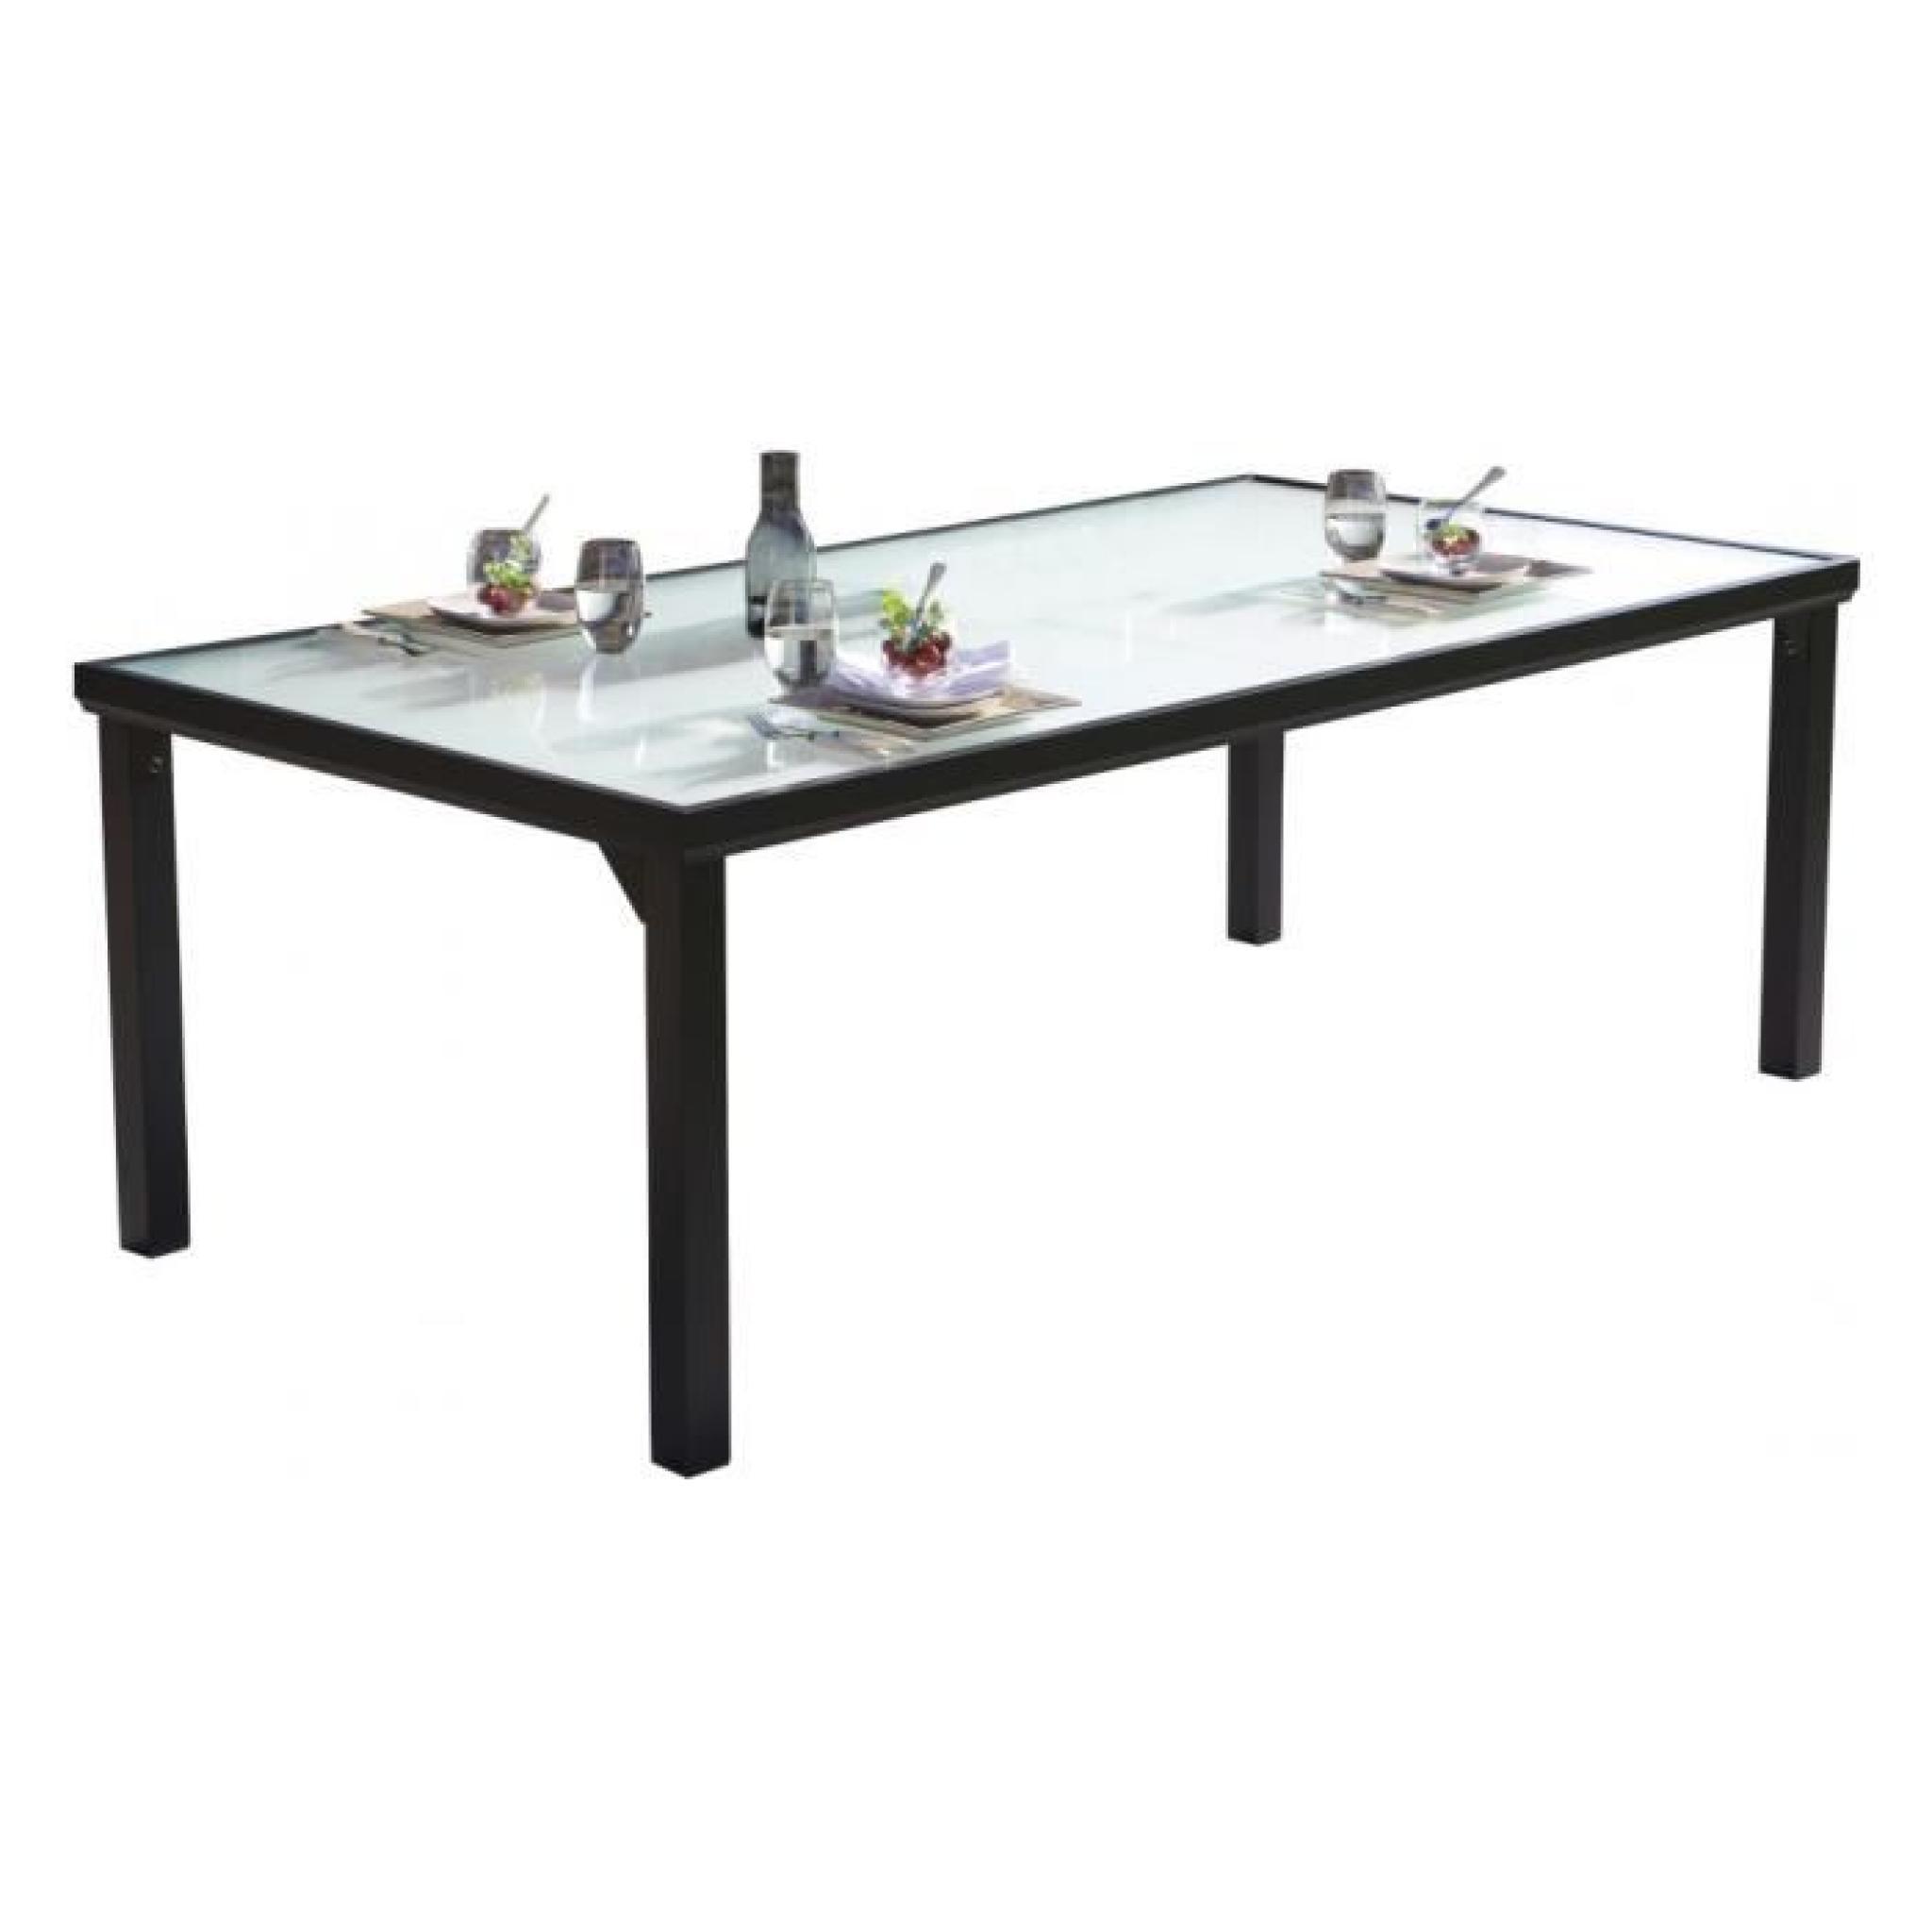 Table de jardin aluminium noir plateau verre trempé L210